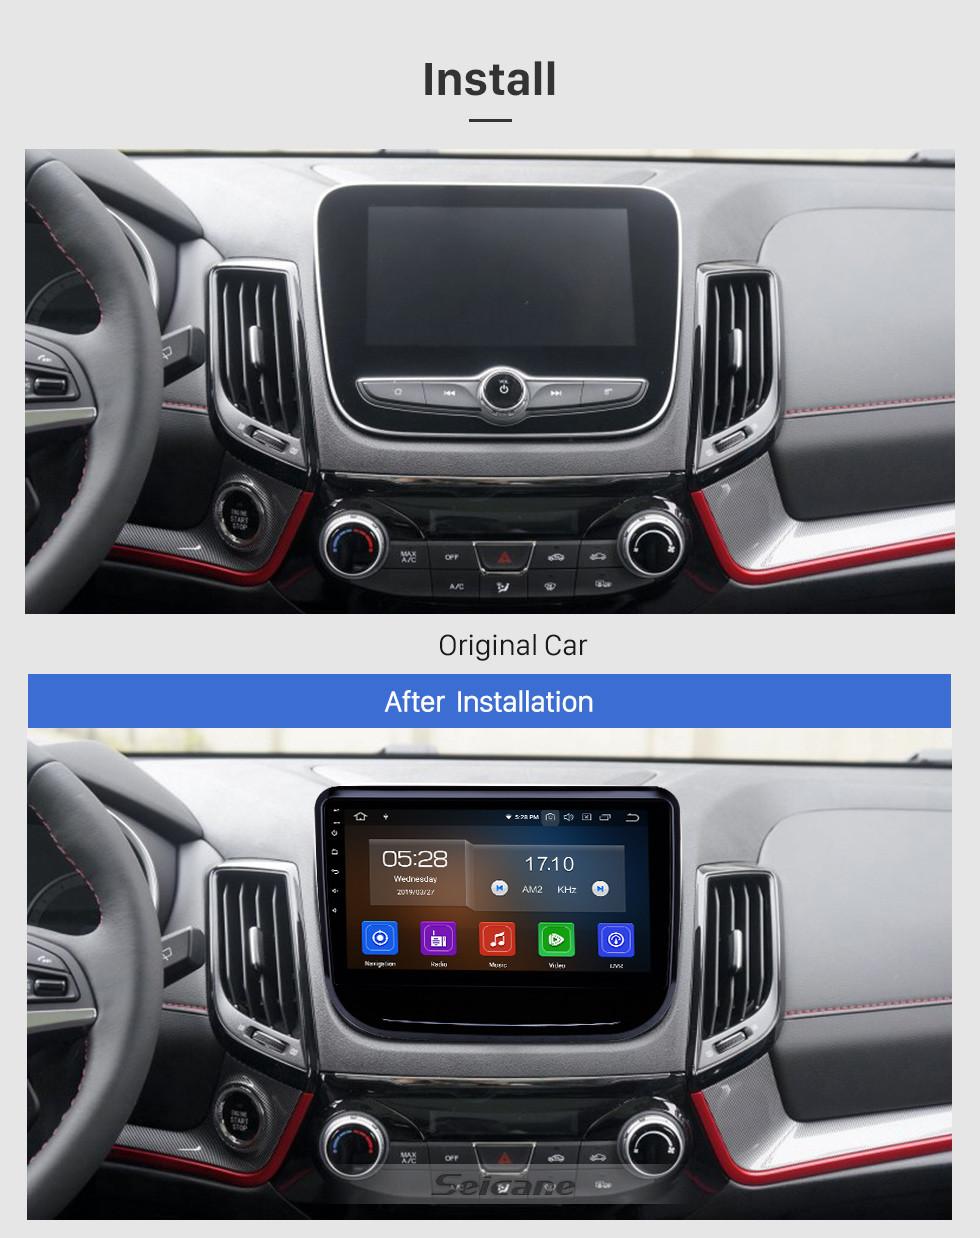 Seicane 10,1 zoll Android 9.0 Radio für 2017-2018 Changan CS55 Bluetooth Touchscreen GPS Navigation Carplay USB AUX unterstützung TPMS DAB + SWC